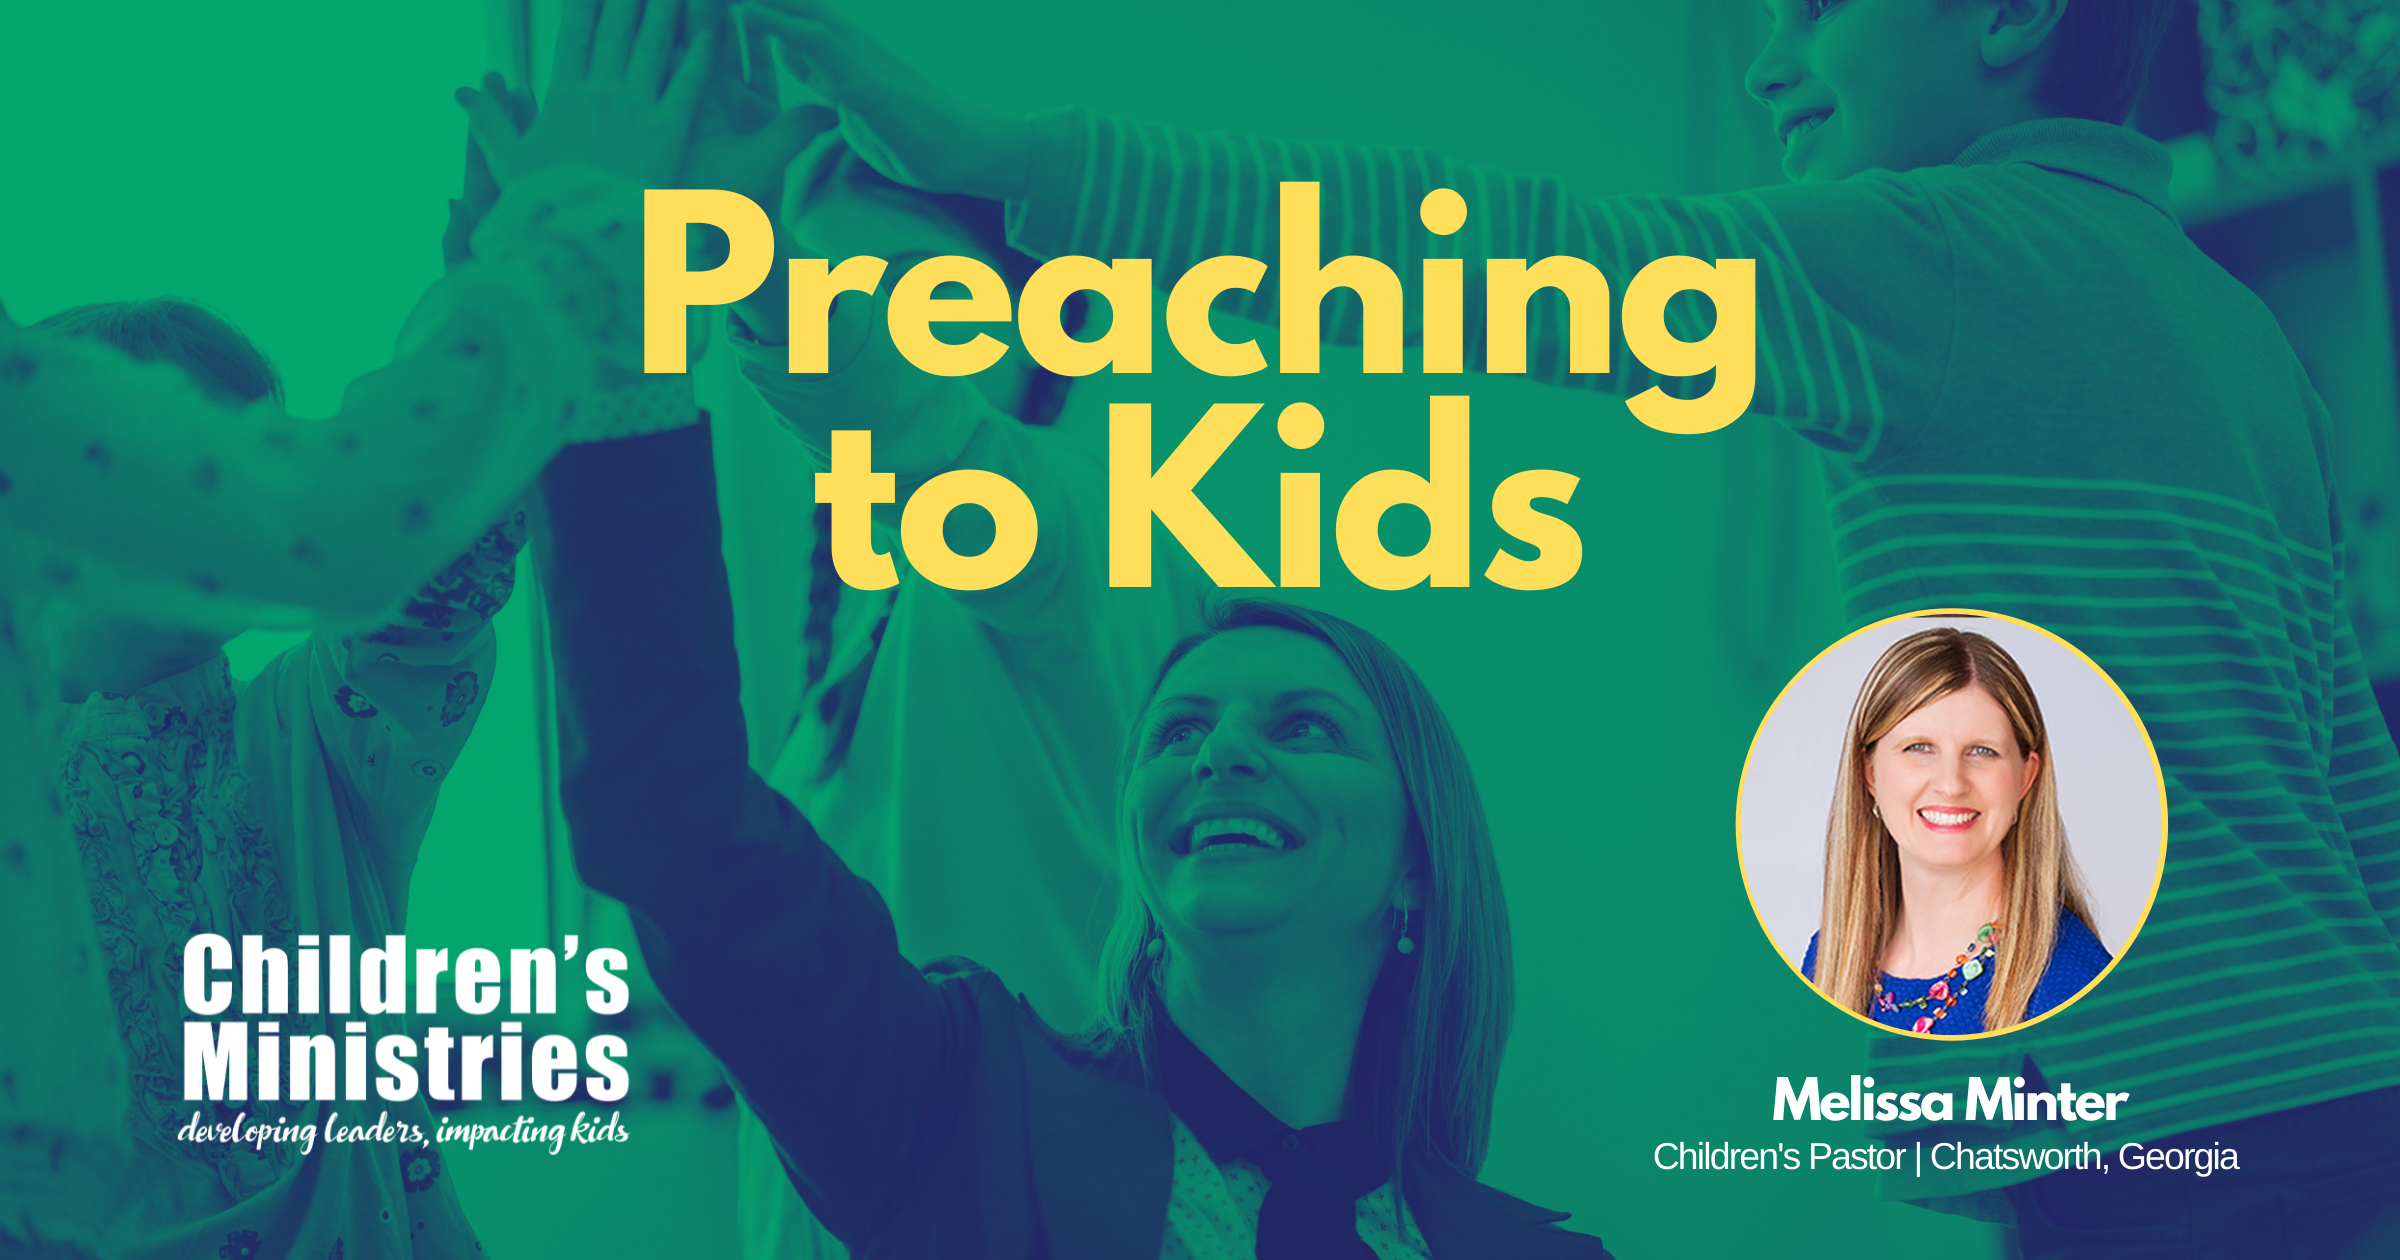 Preaching to Kids